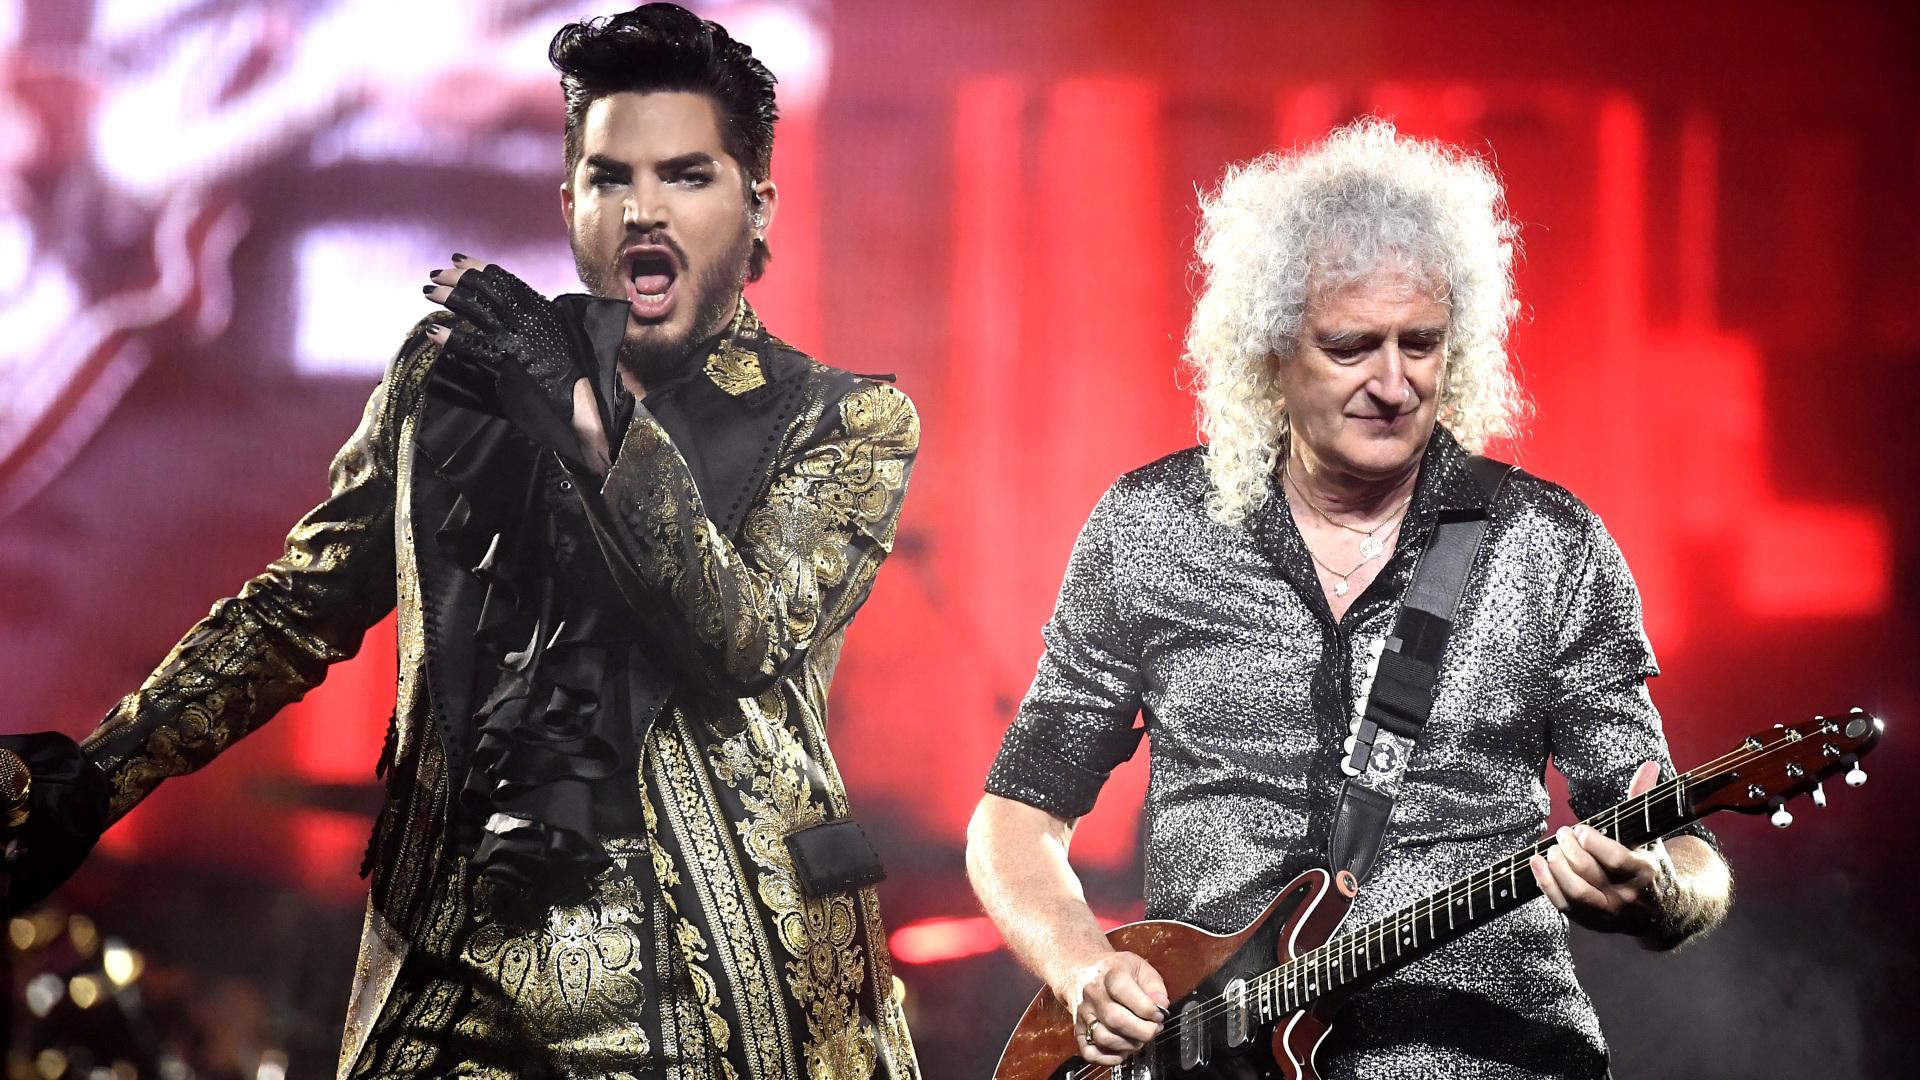 Queen And Adam Lambert , HD Wallpaper & Backgrounds